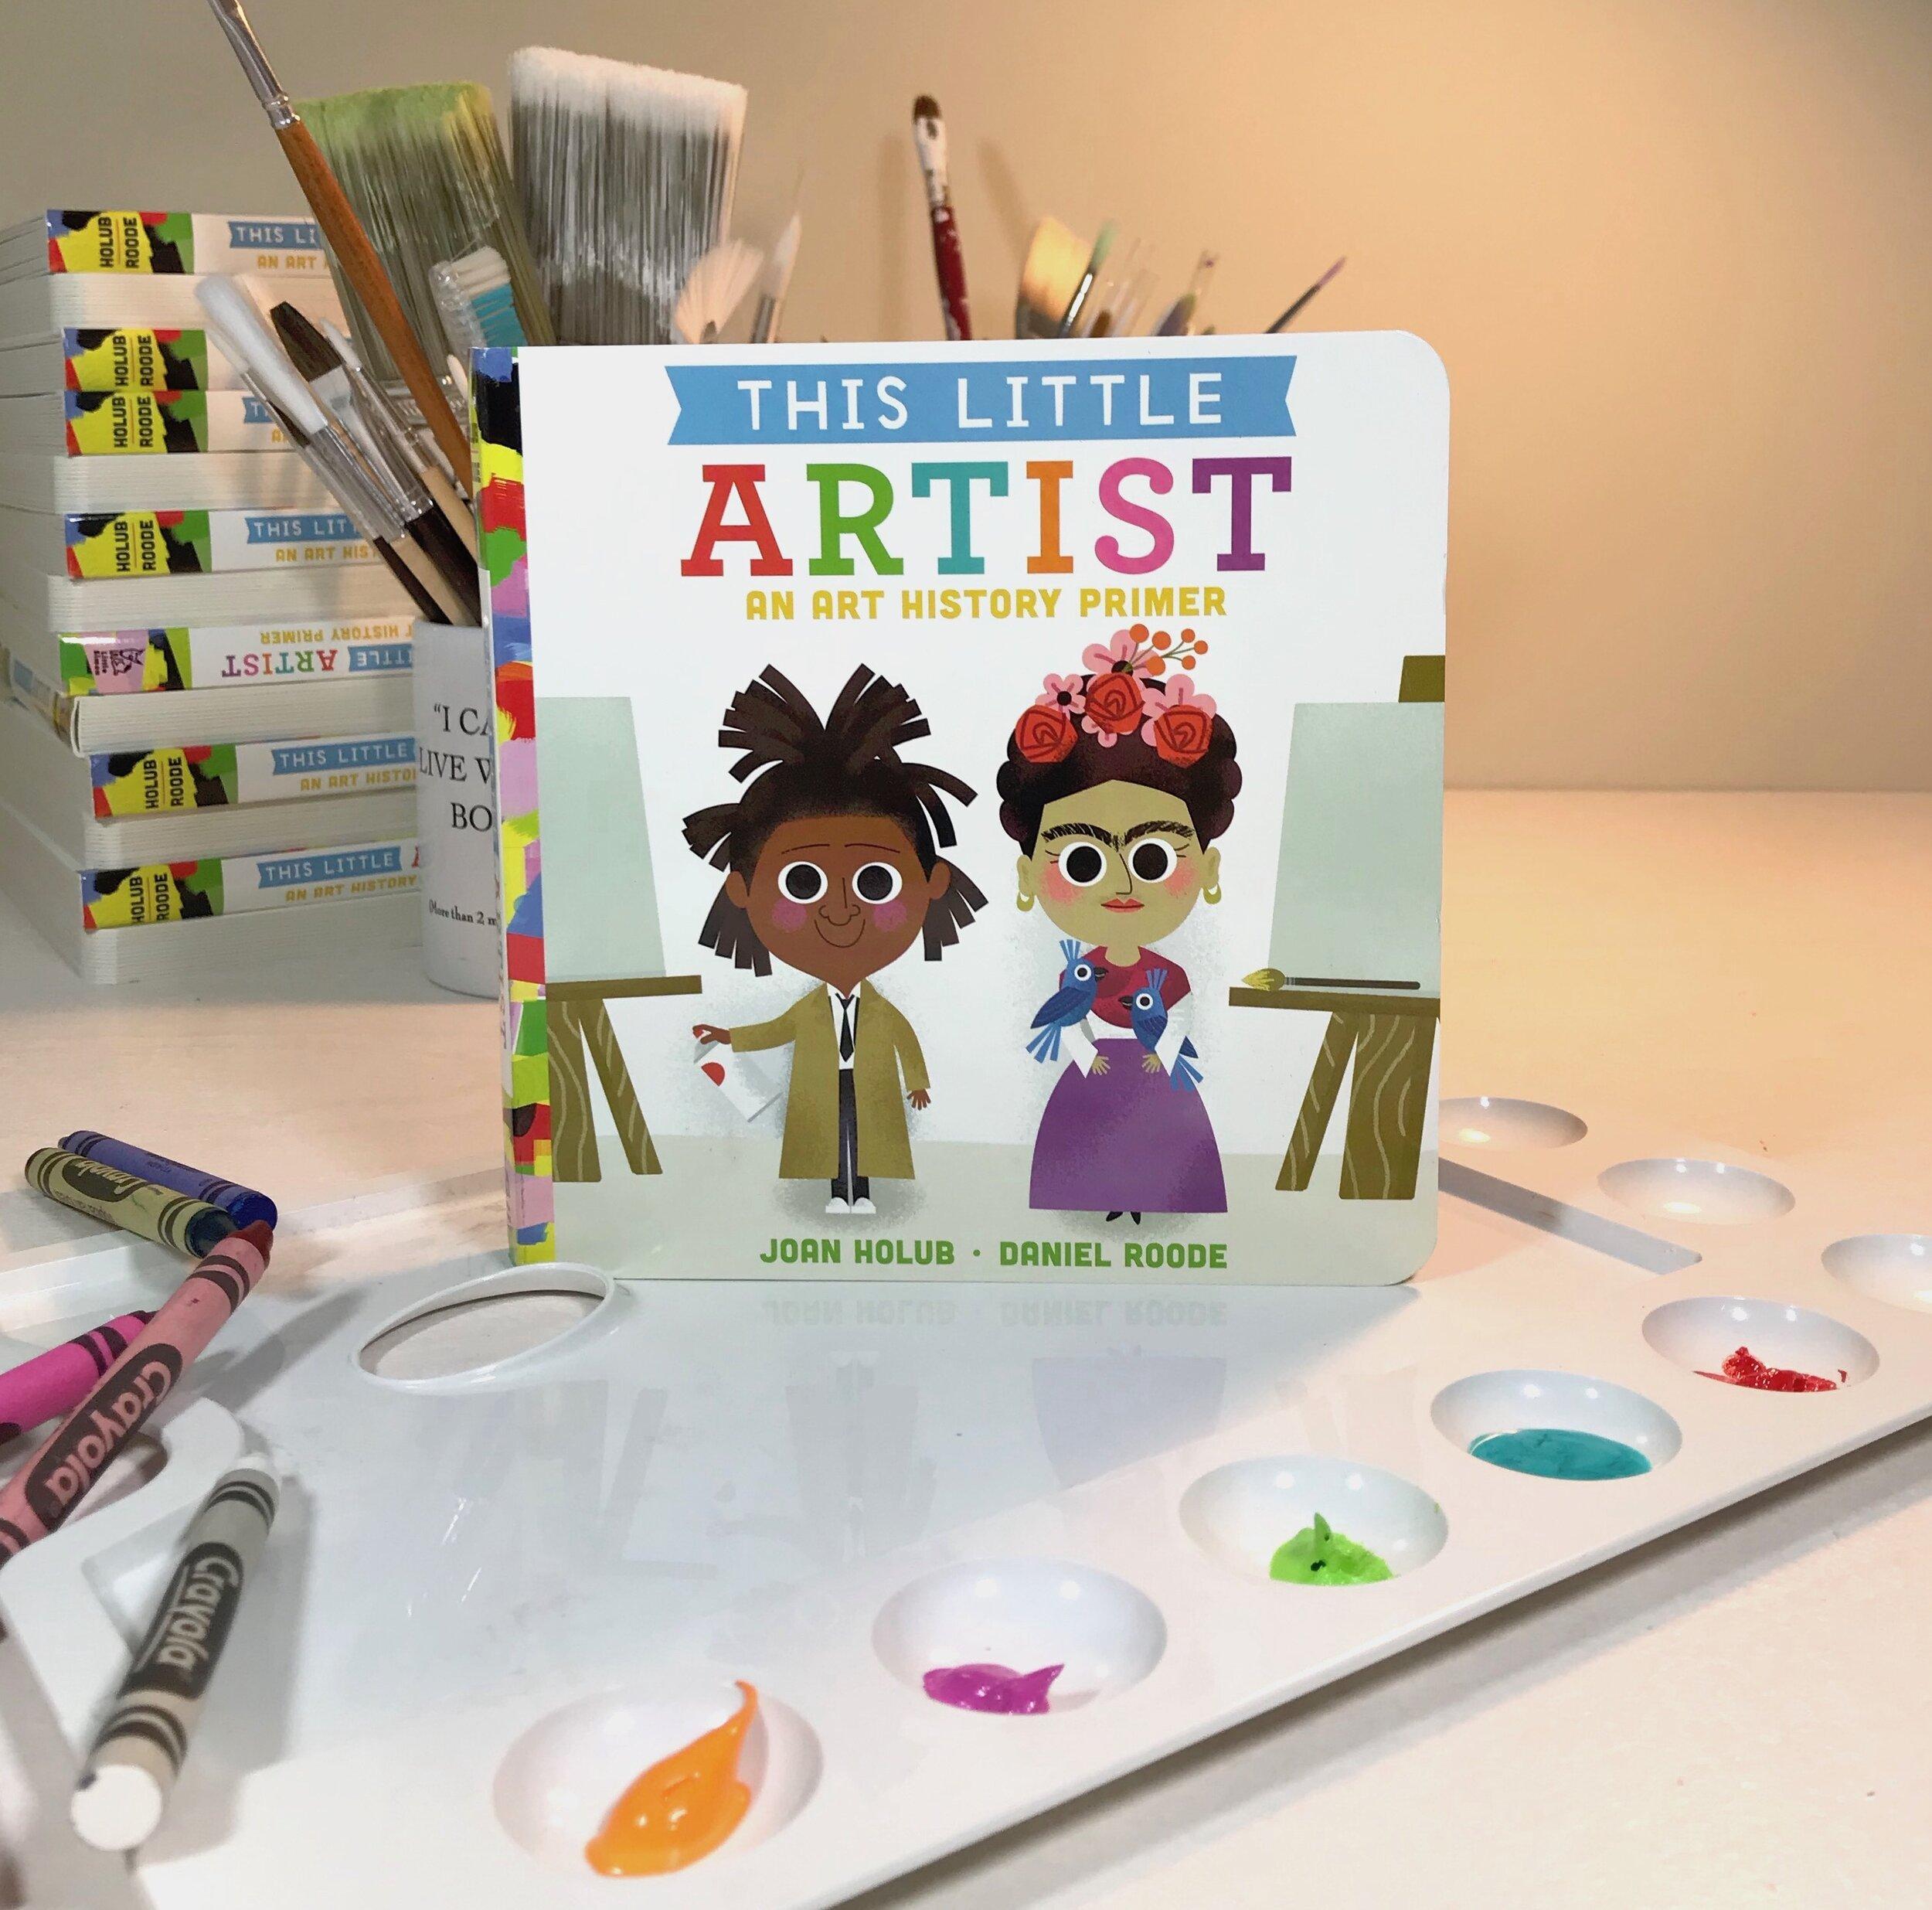 This Little Artist, An Art History Primer (baby, toddler, PreK) #6 in the series by Joan Holub & Daniel Roode